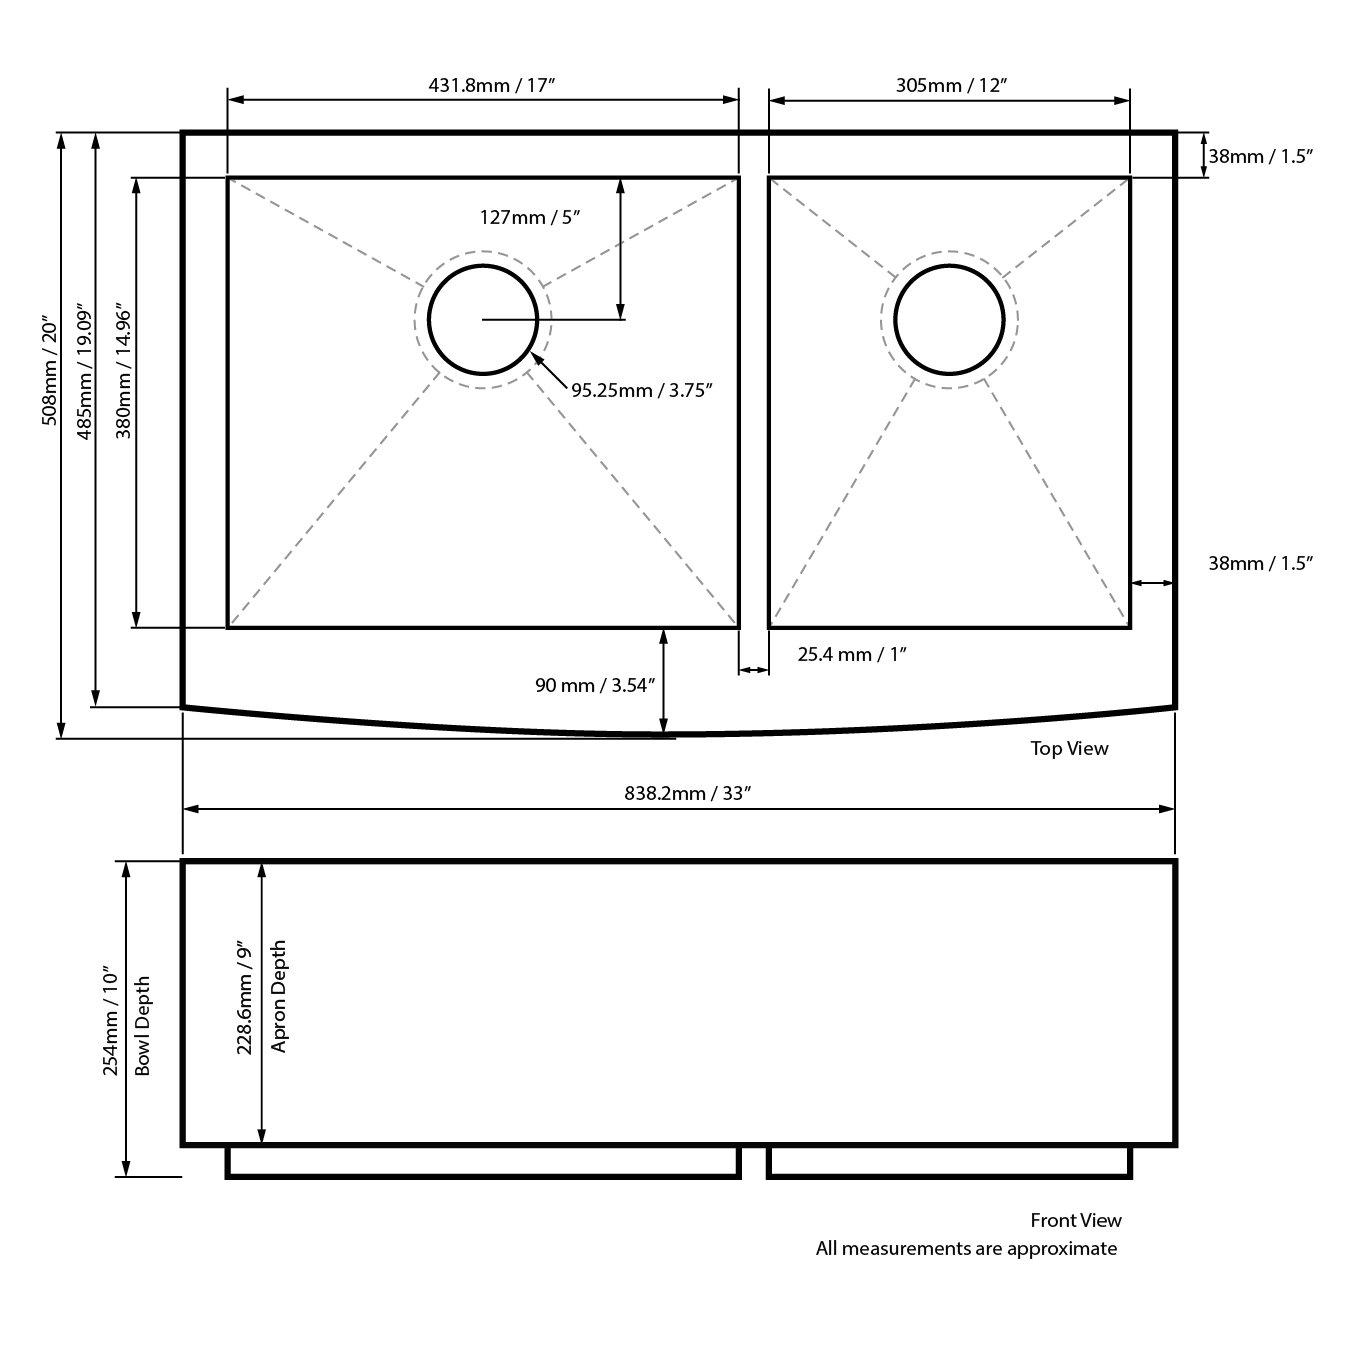 Decor Star F-002-Z 33 Inch x 20 Inch Farmhouse Apron 60/40 Offset Double Bowl 16 Gauge Stainless Steel Luxury Handmade Kitchen Sink cUPC Zero Radius by Décor Star (Image #8)